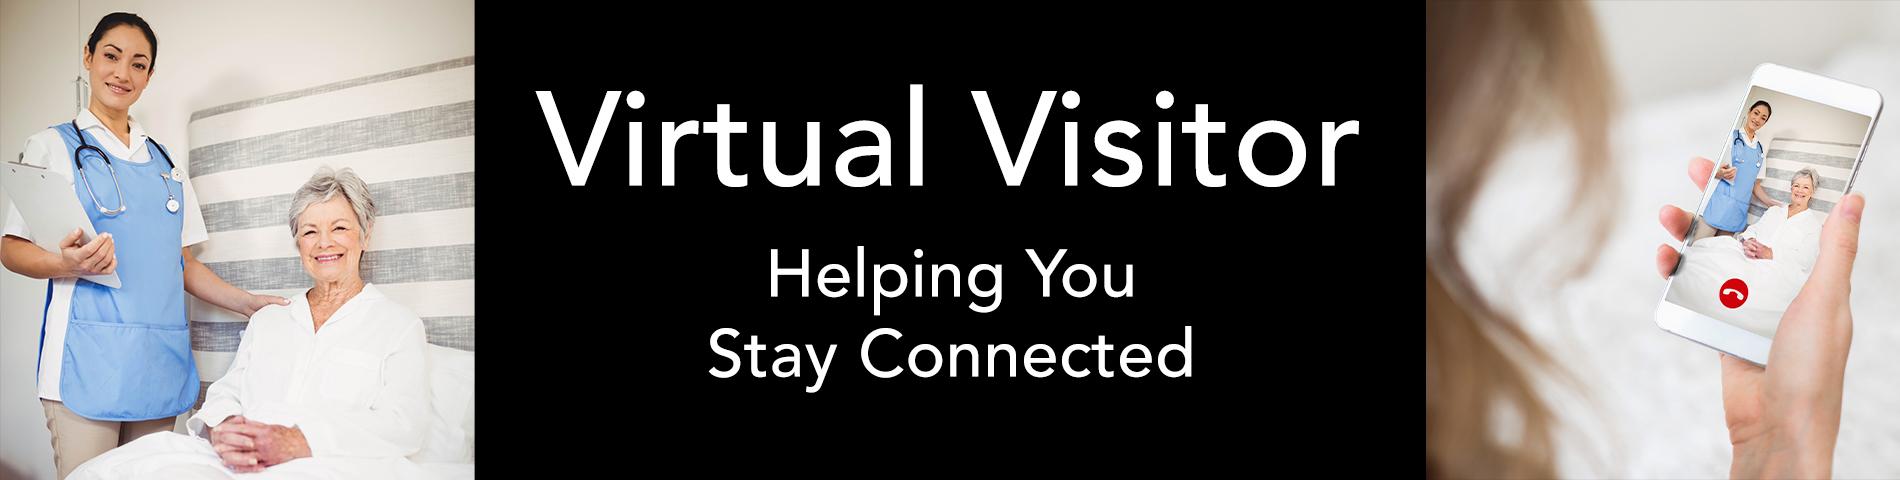 Virtual Visitor